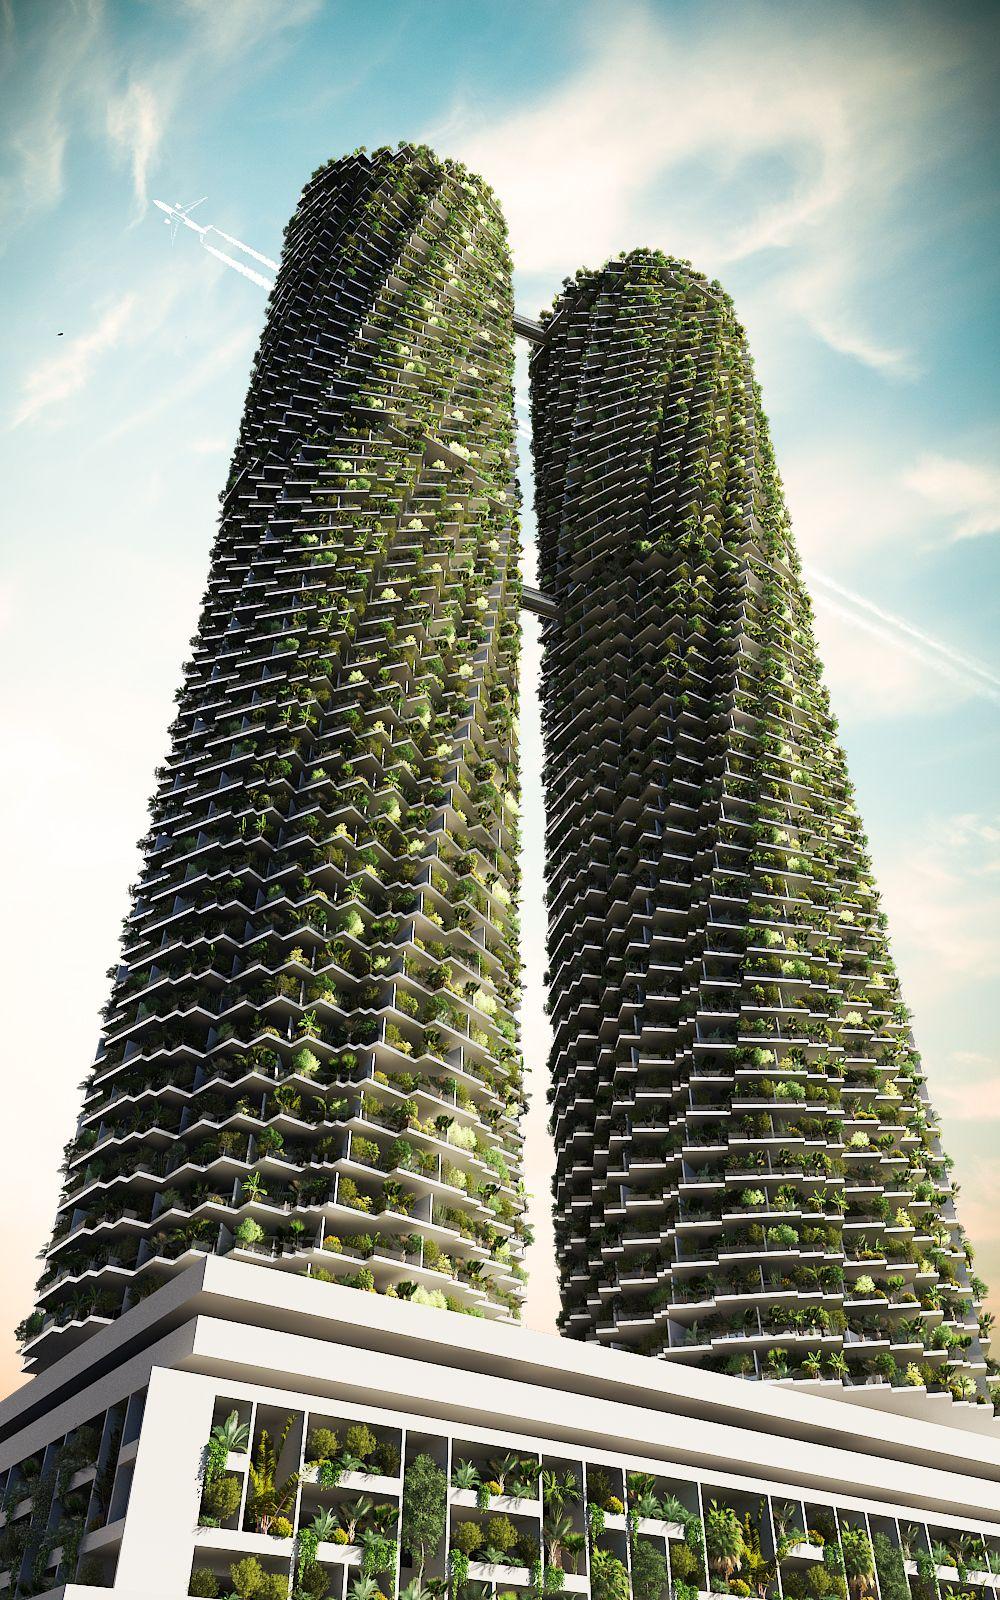 Rotating Towers - Miami 806